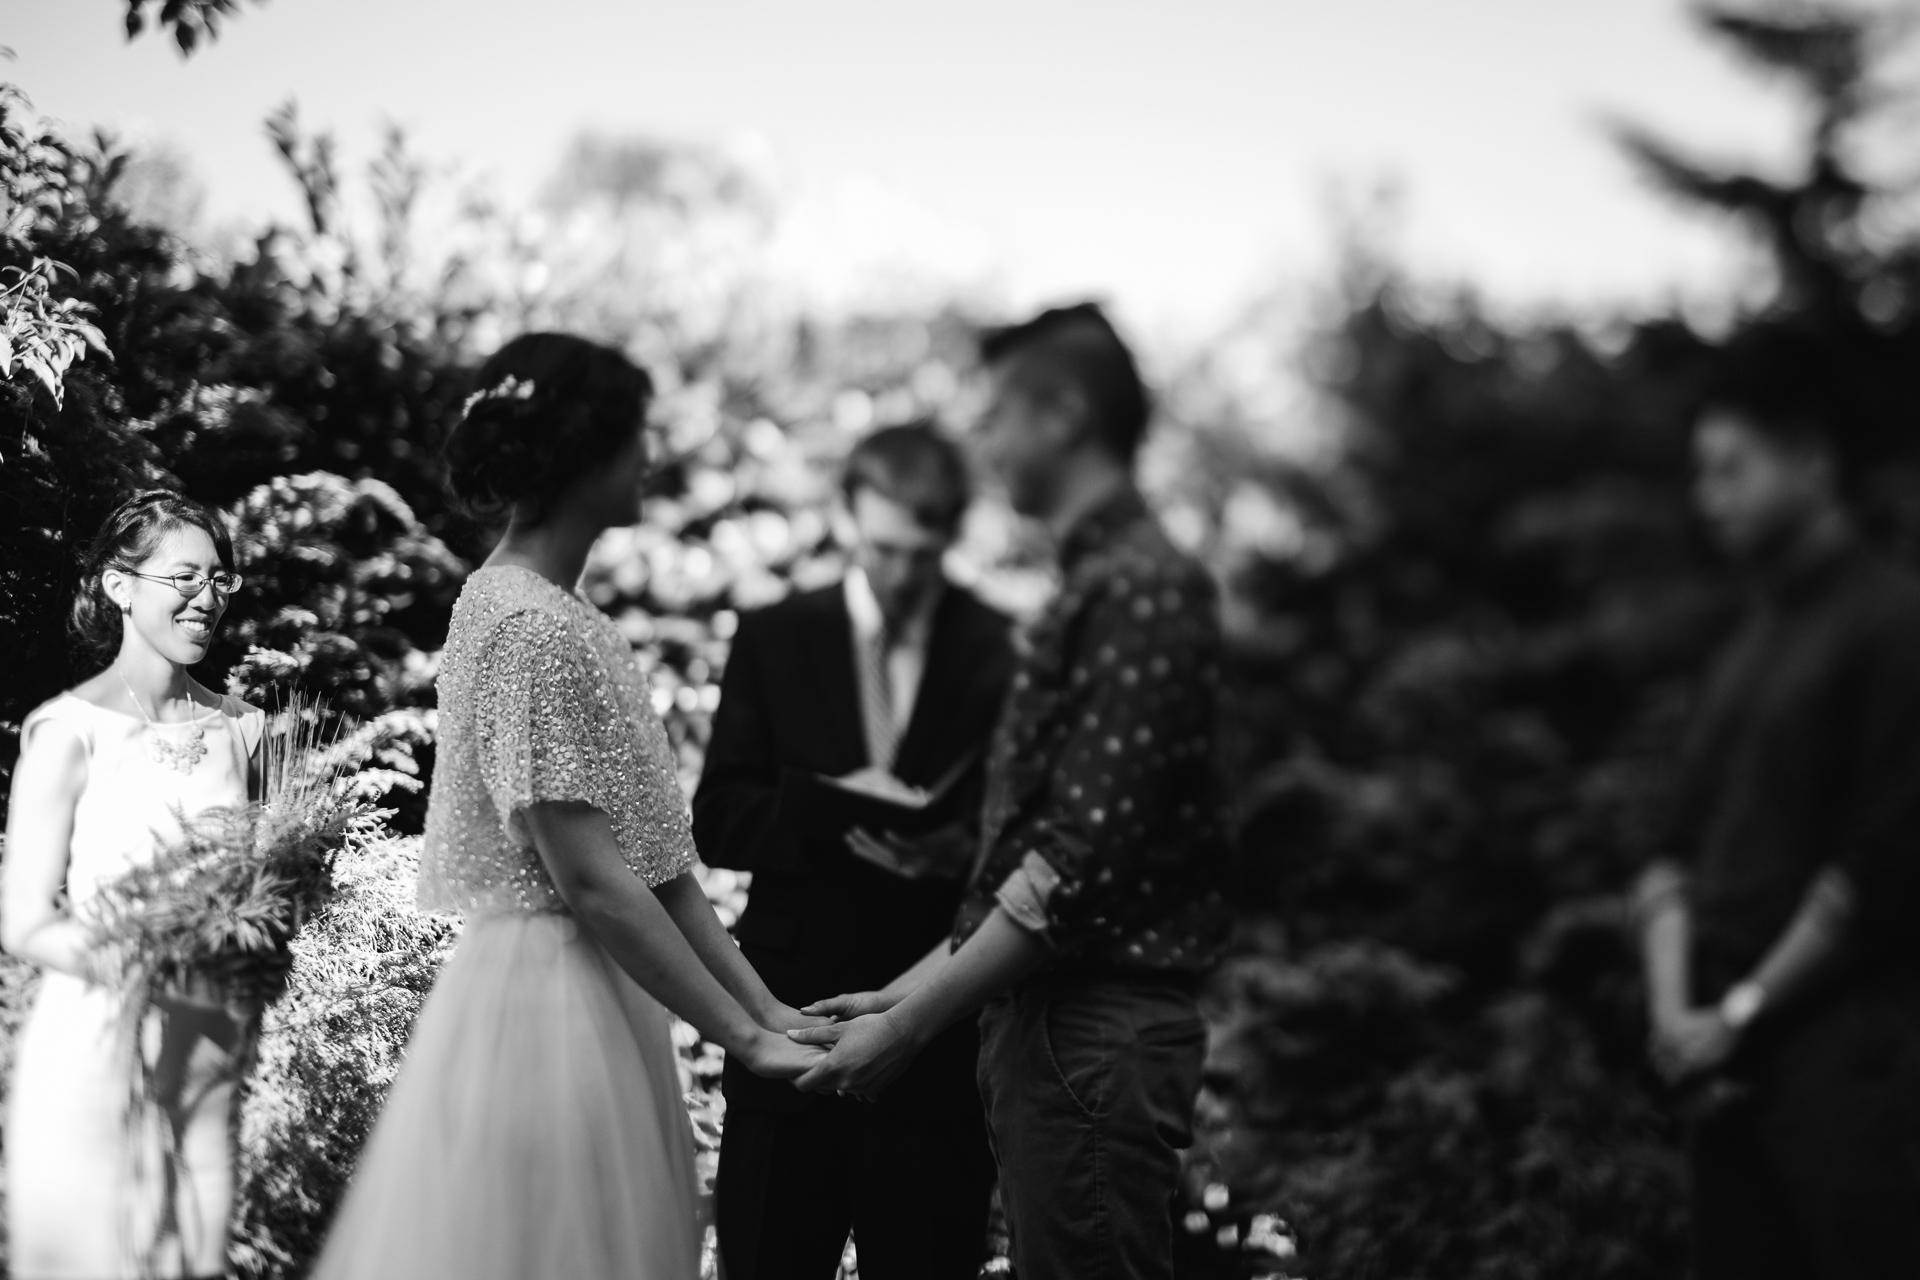 jess-hunter-seattle-artistic-wedding-photographer-4968.jpg